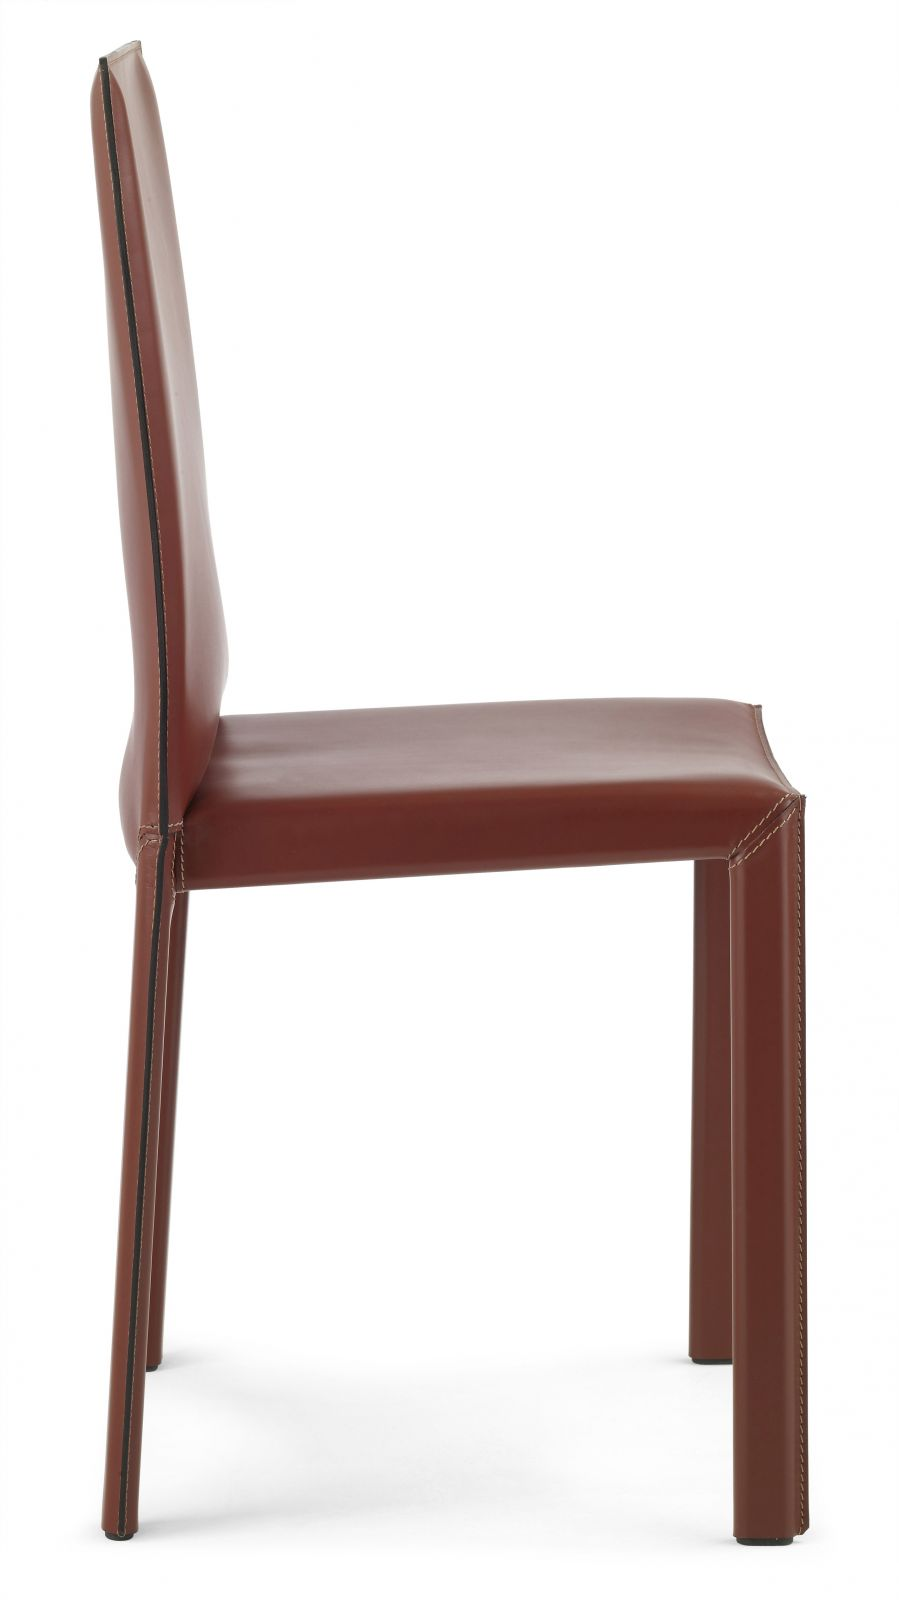 modern-office-furniture-chairs-Italian-designer-furniture (34).jpg